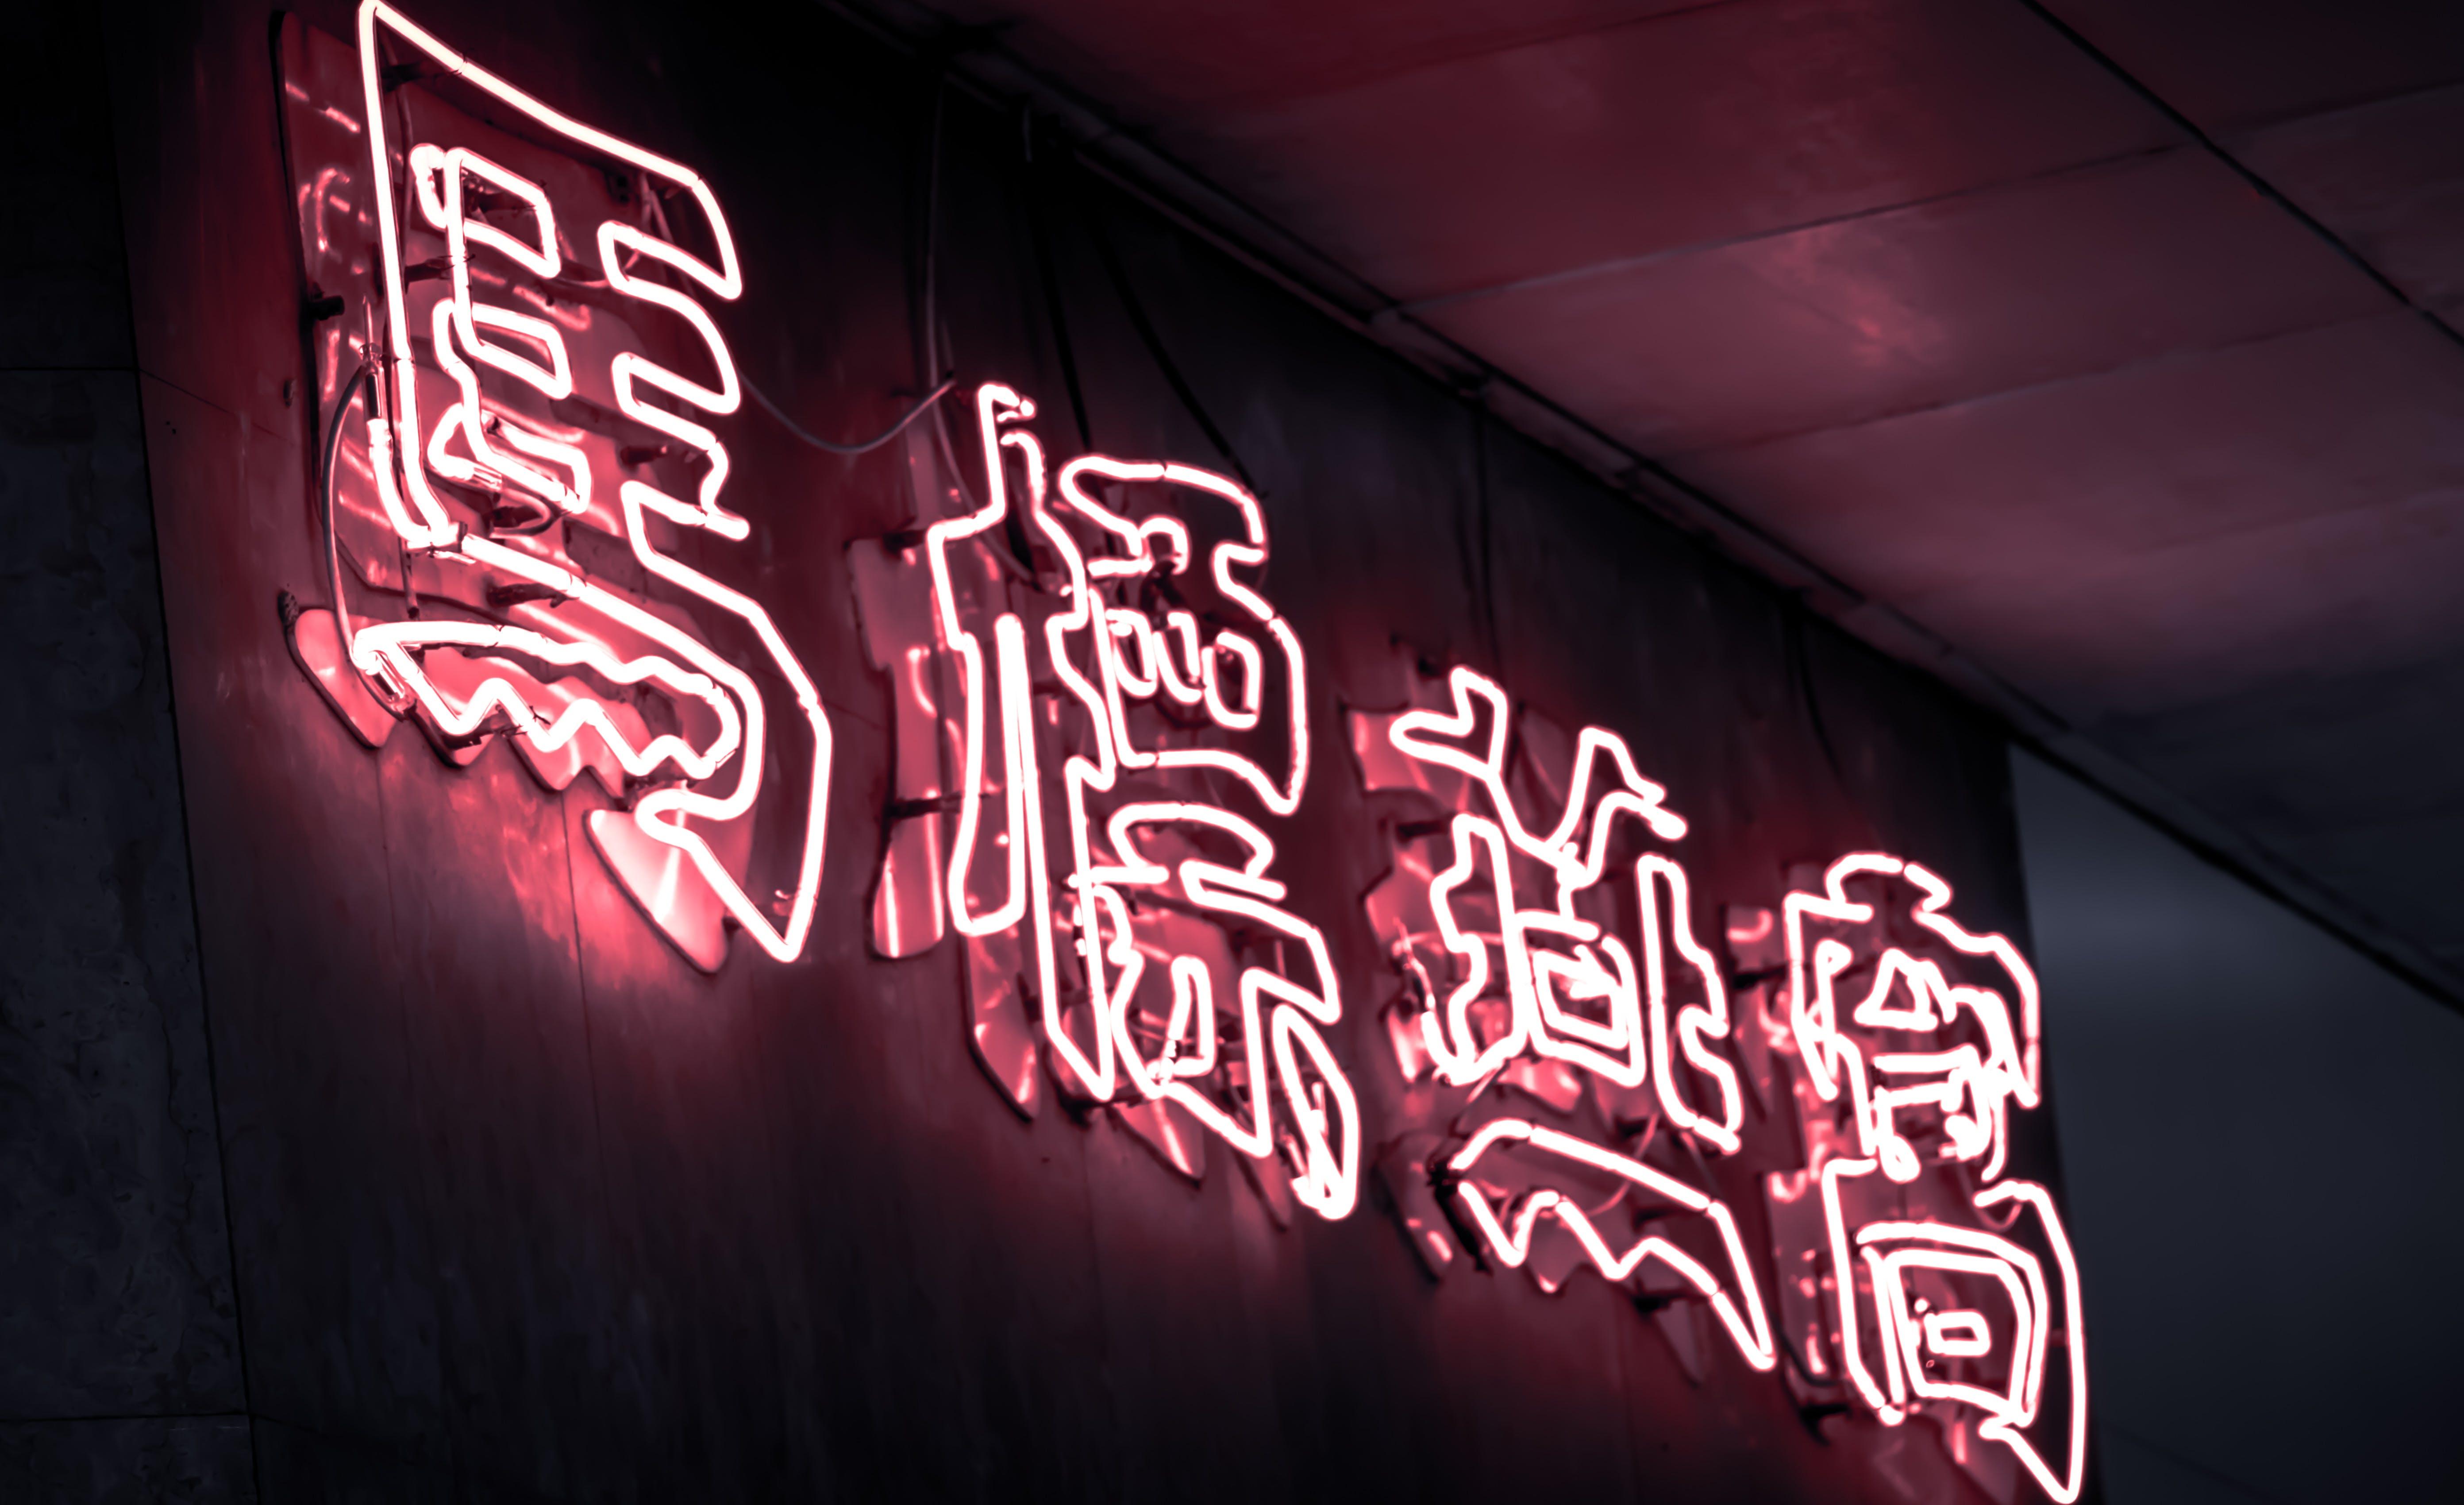 Gratis lagerfoto af baglygte, hongkong, neon, neon tegn